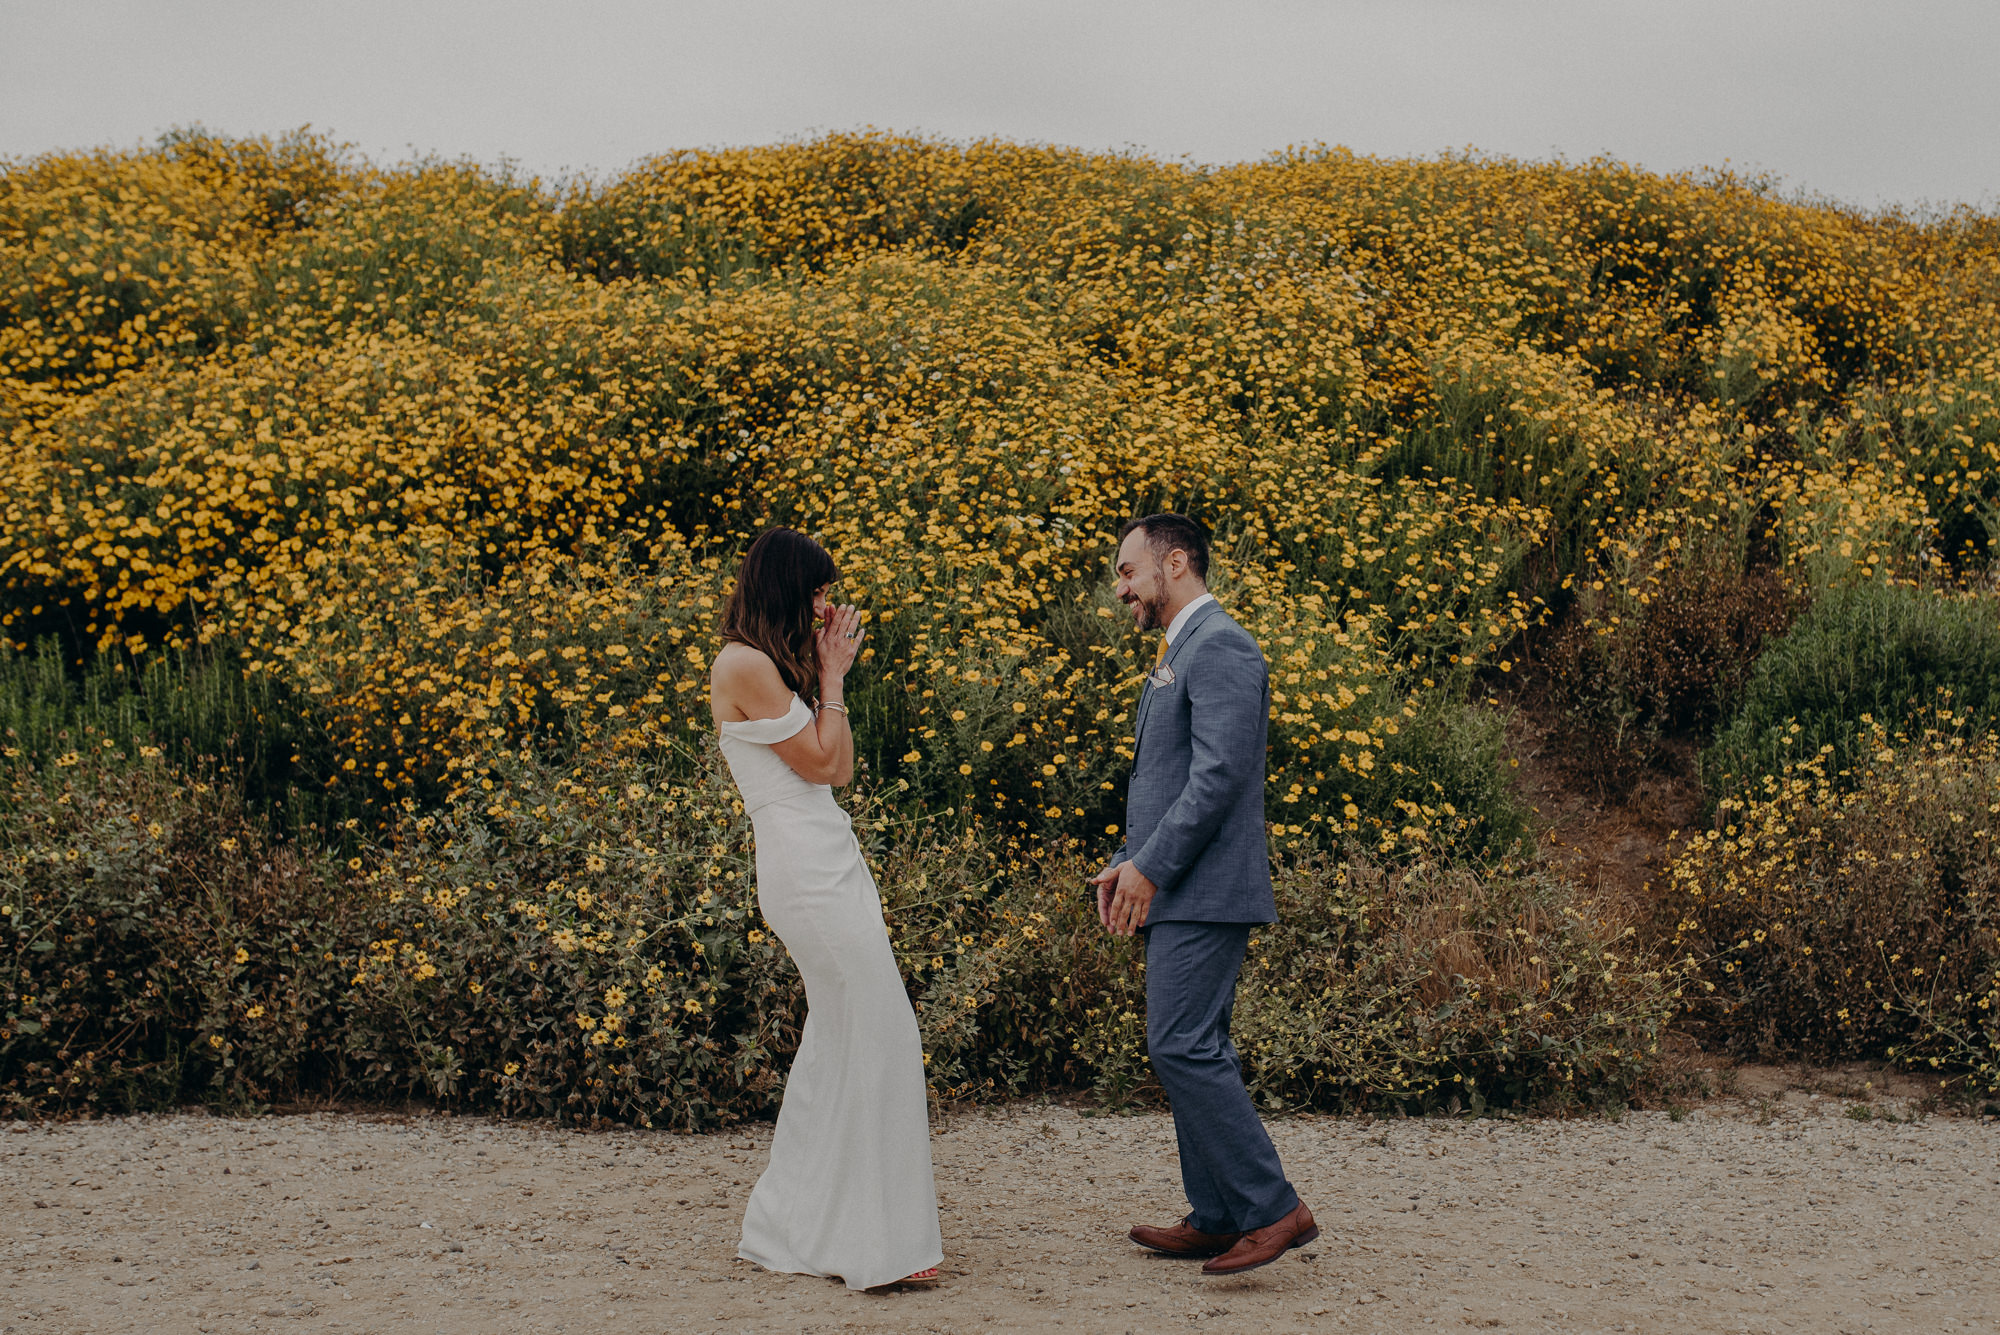 elopement photographer in los angeles - la wedding photographer - isaiahandtaylor.com-011.jpg